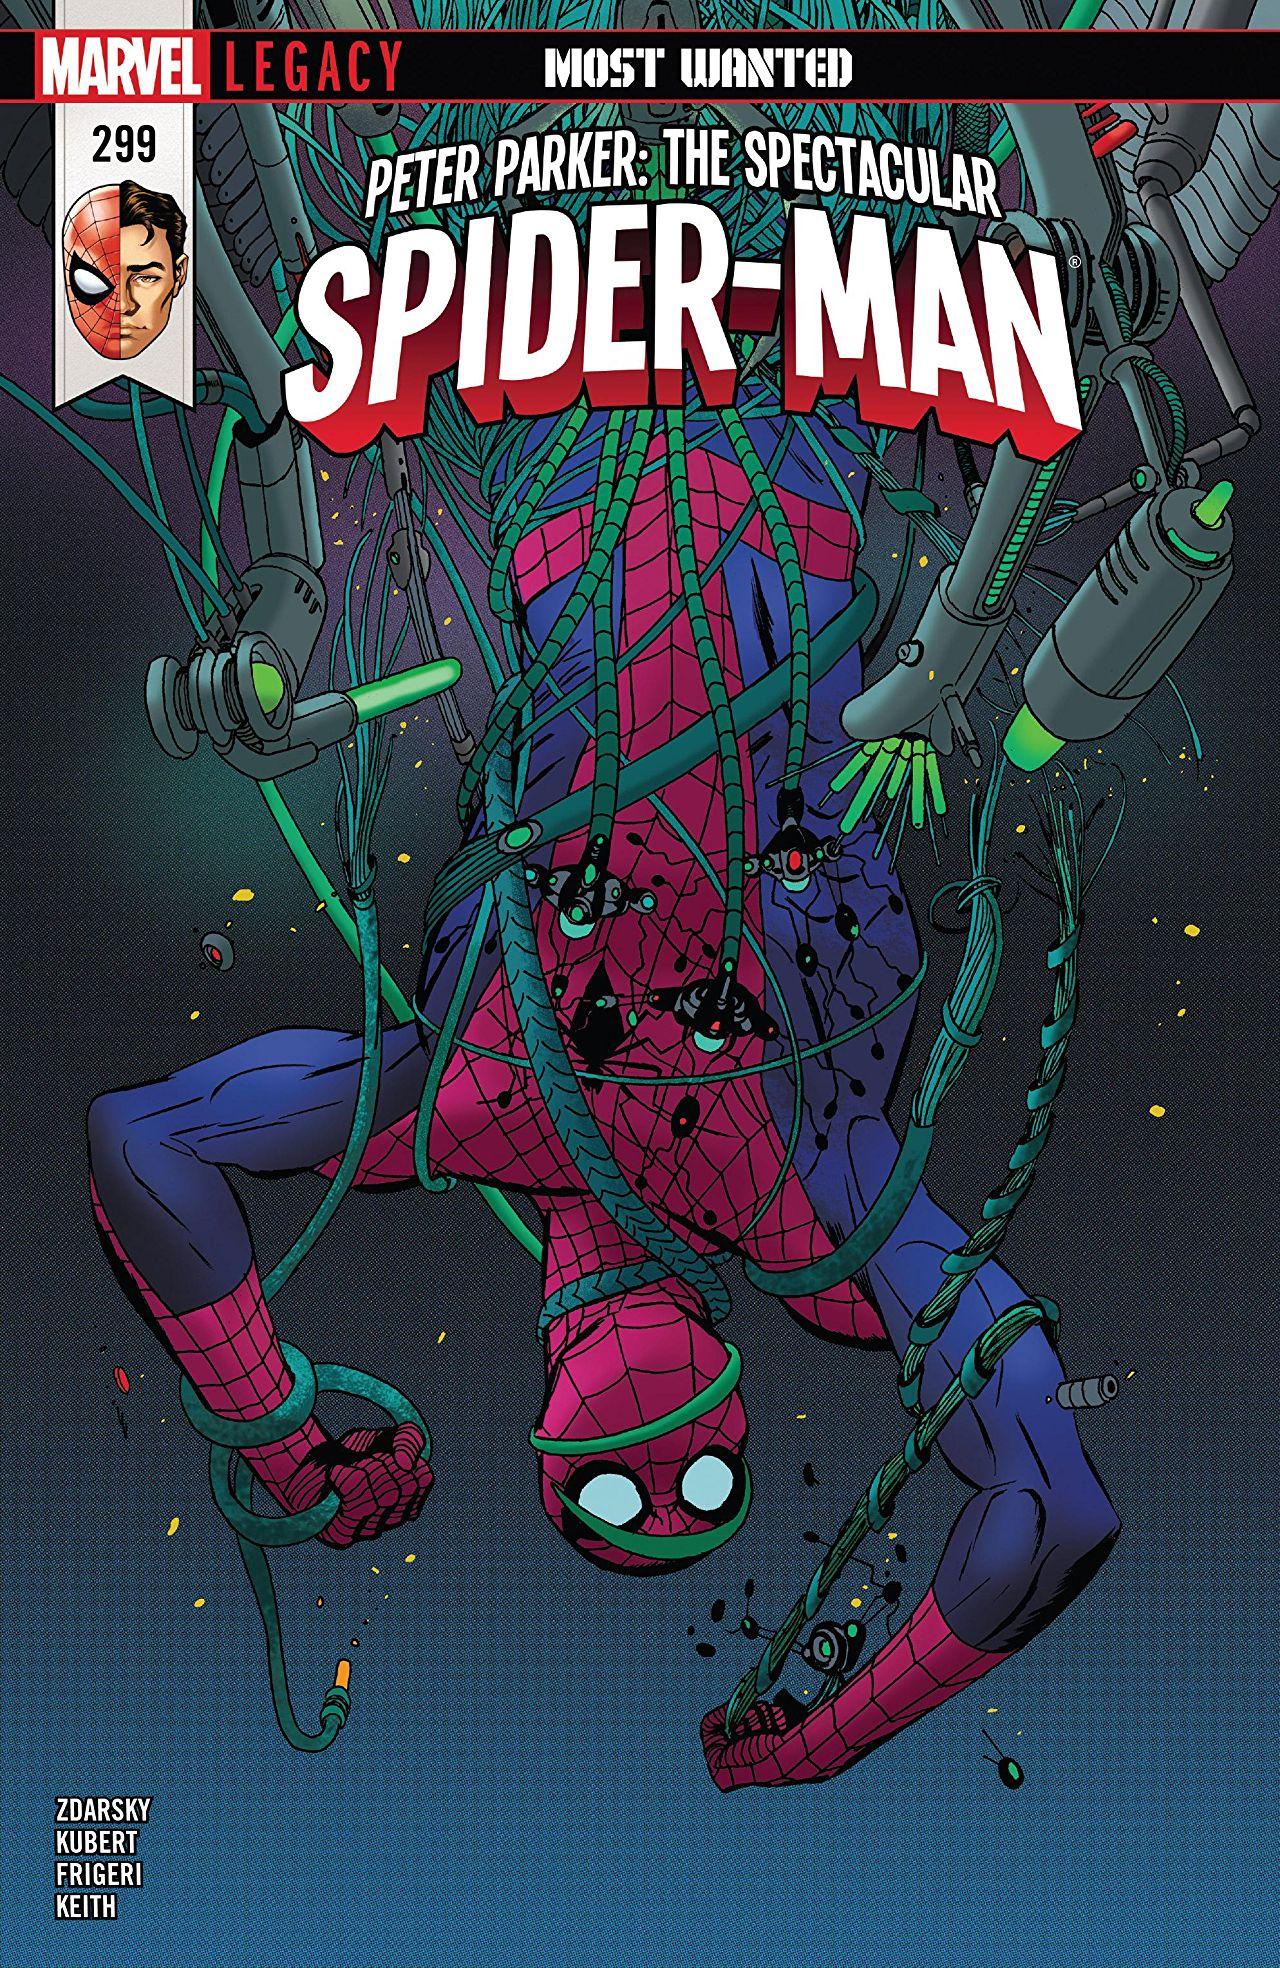 Peter Parker - The Spectacular Spider-Man 299 - Desperate Measures